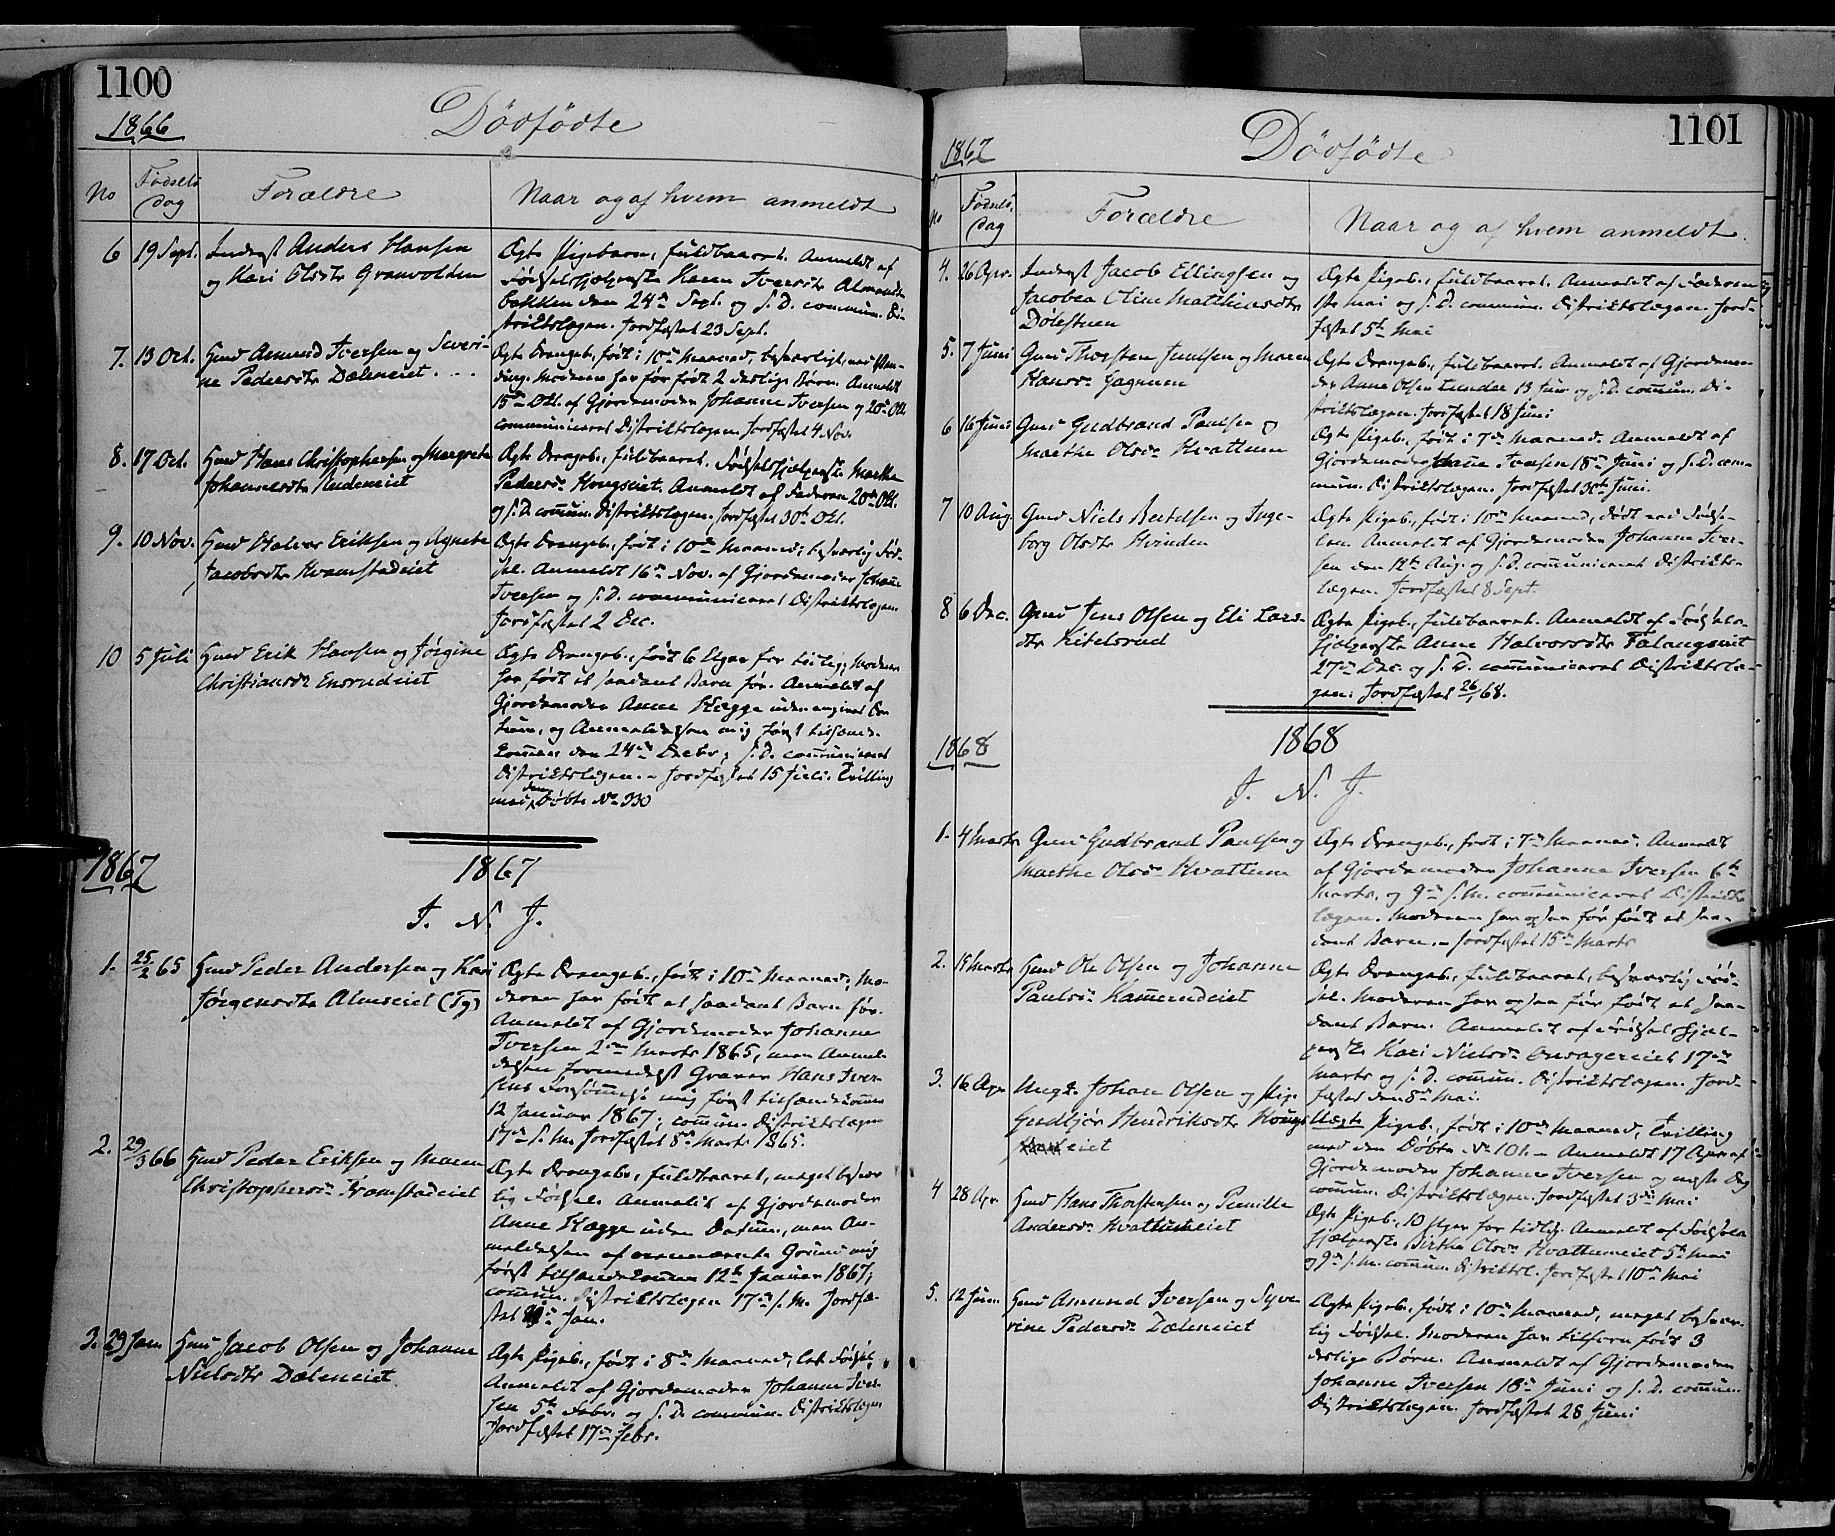 SAH, Gran prestekontor, Ministerialbok nr. 12, 1856-1874, s. 1100-1101